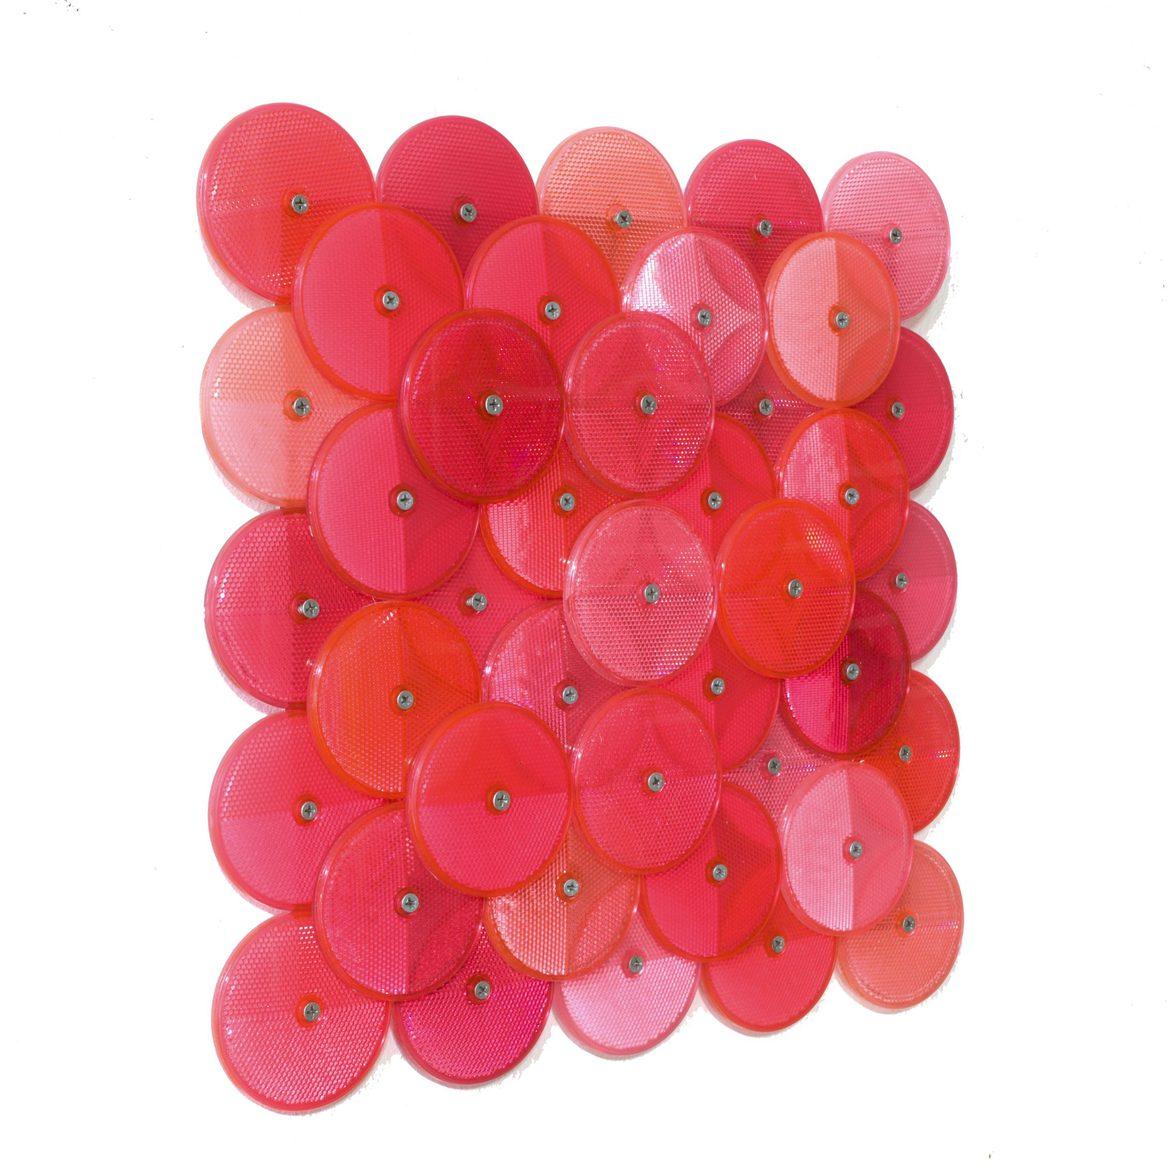 Dust (Pink), customised corner reflectors, 42 x 42cm, side view